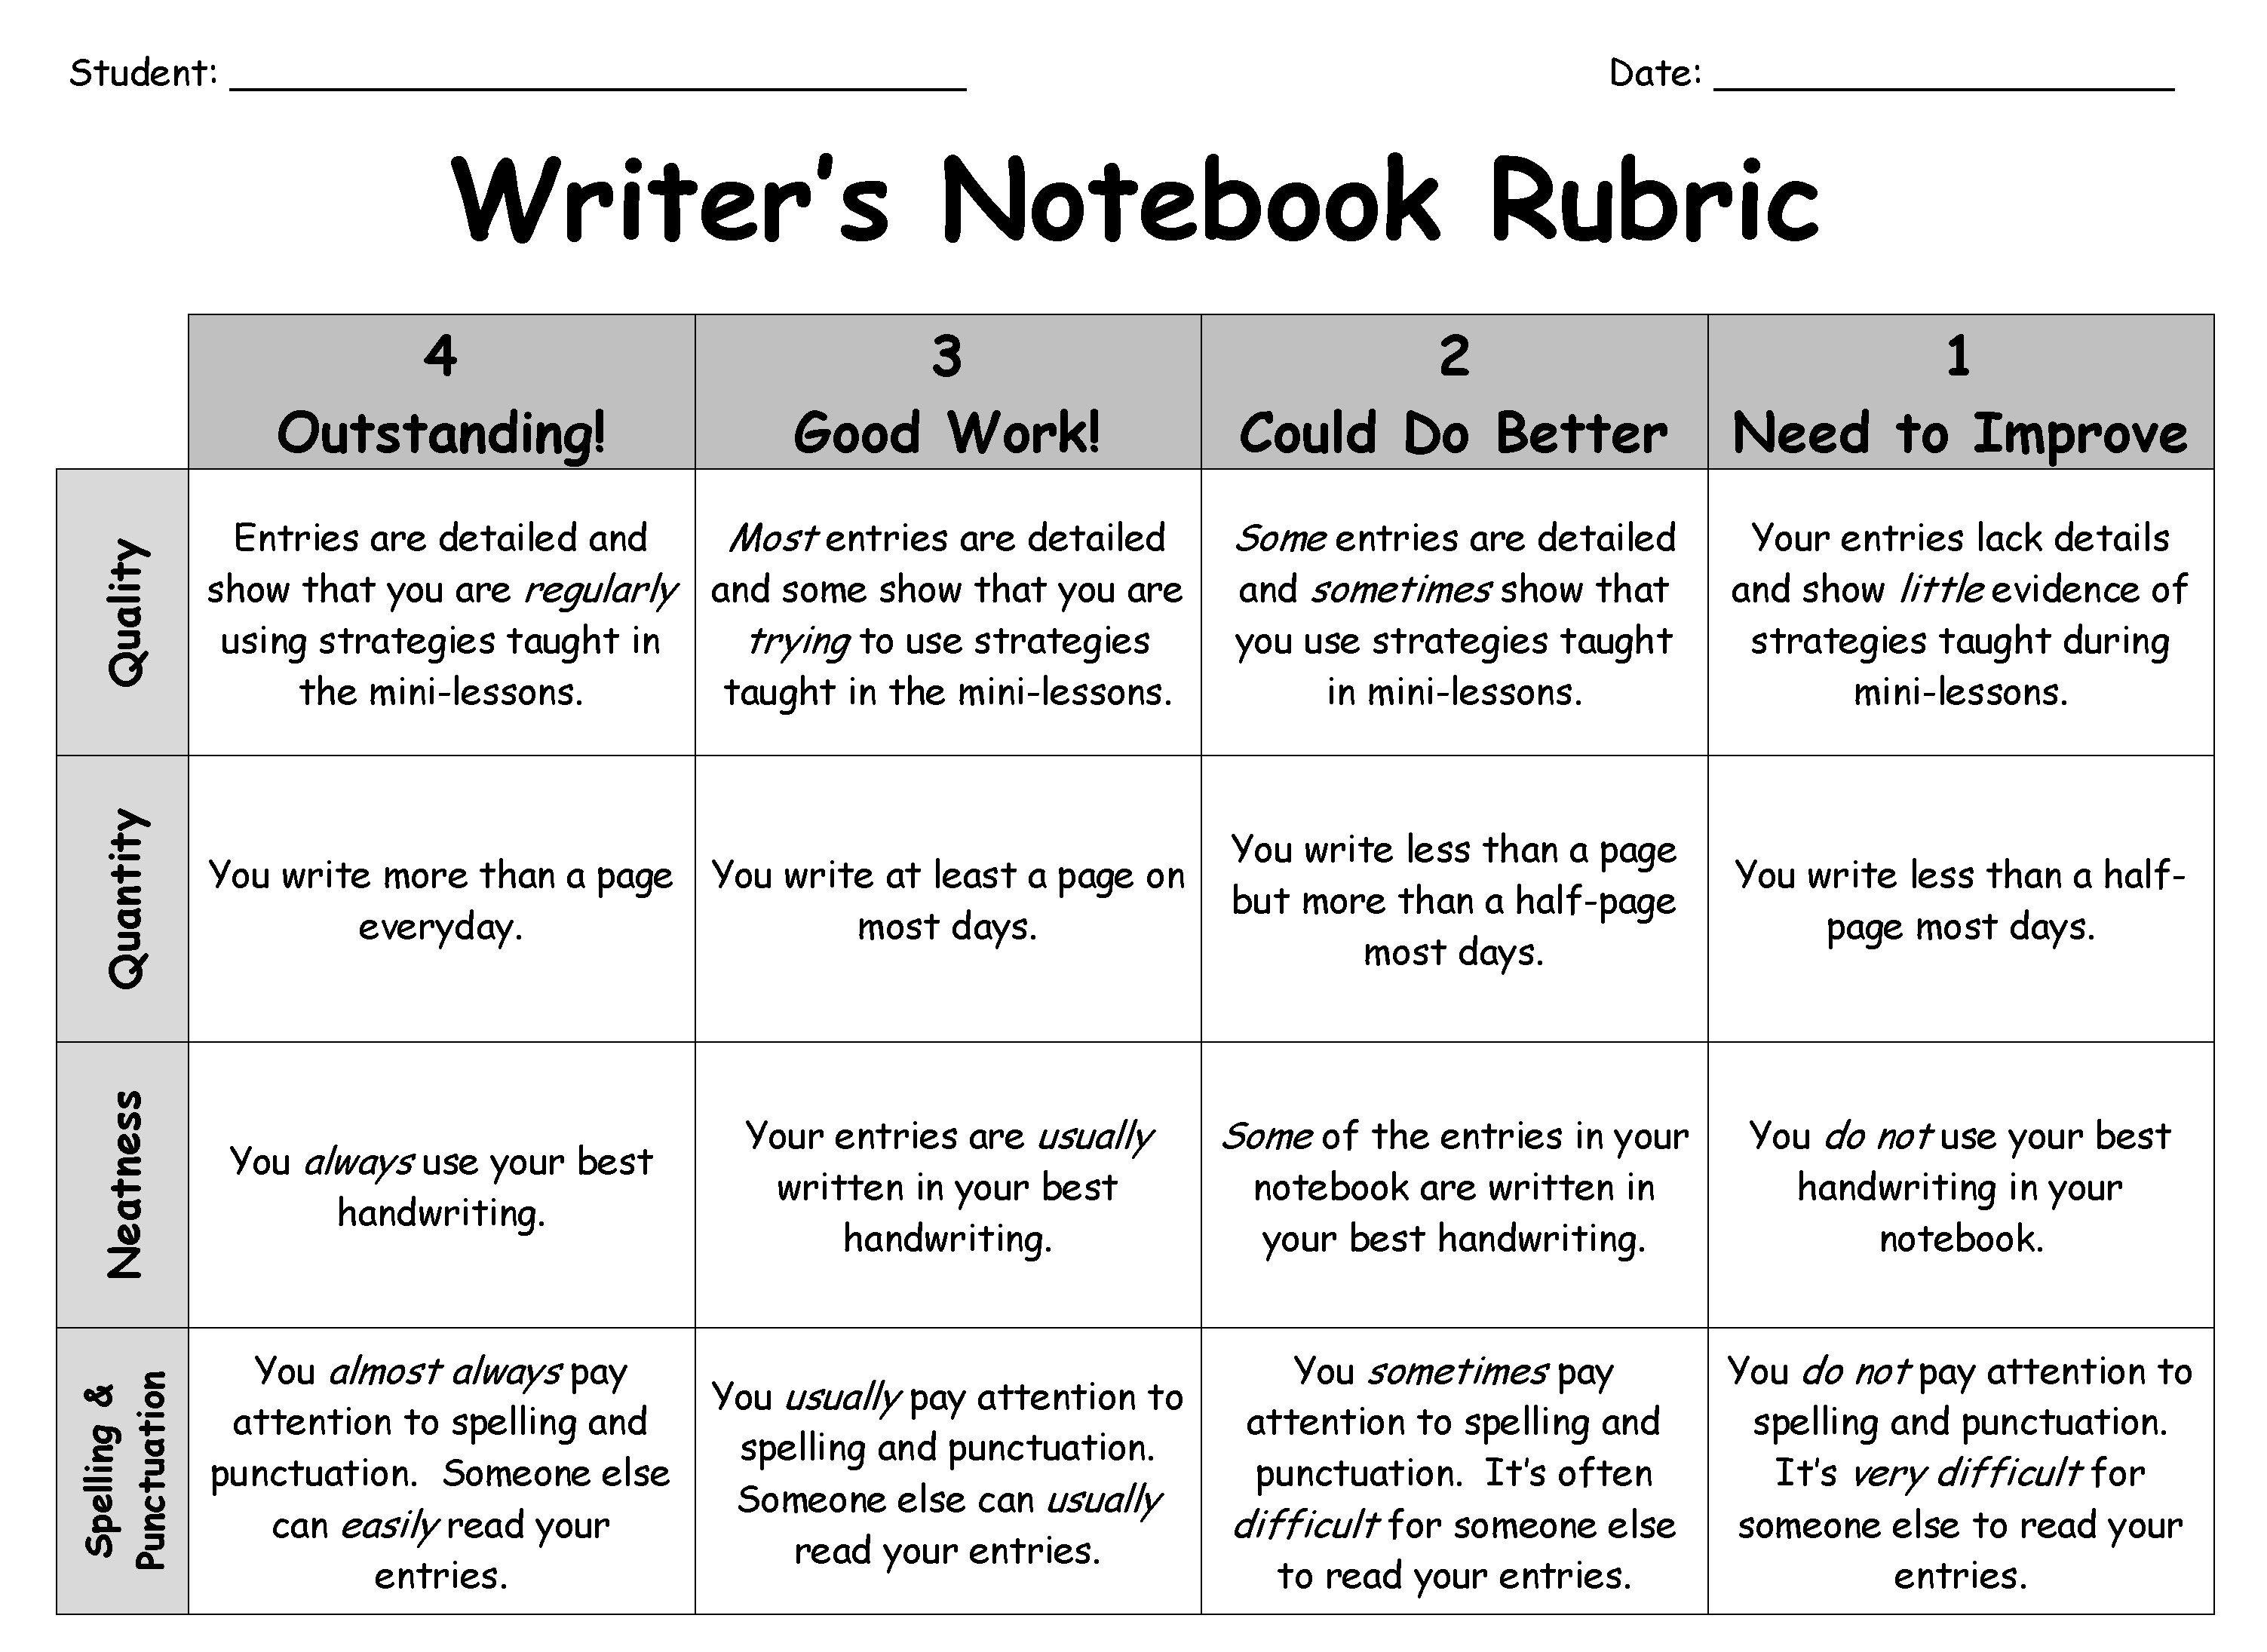 Short essay response rubric